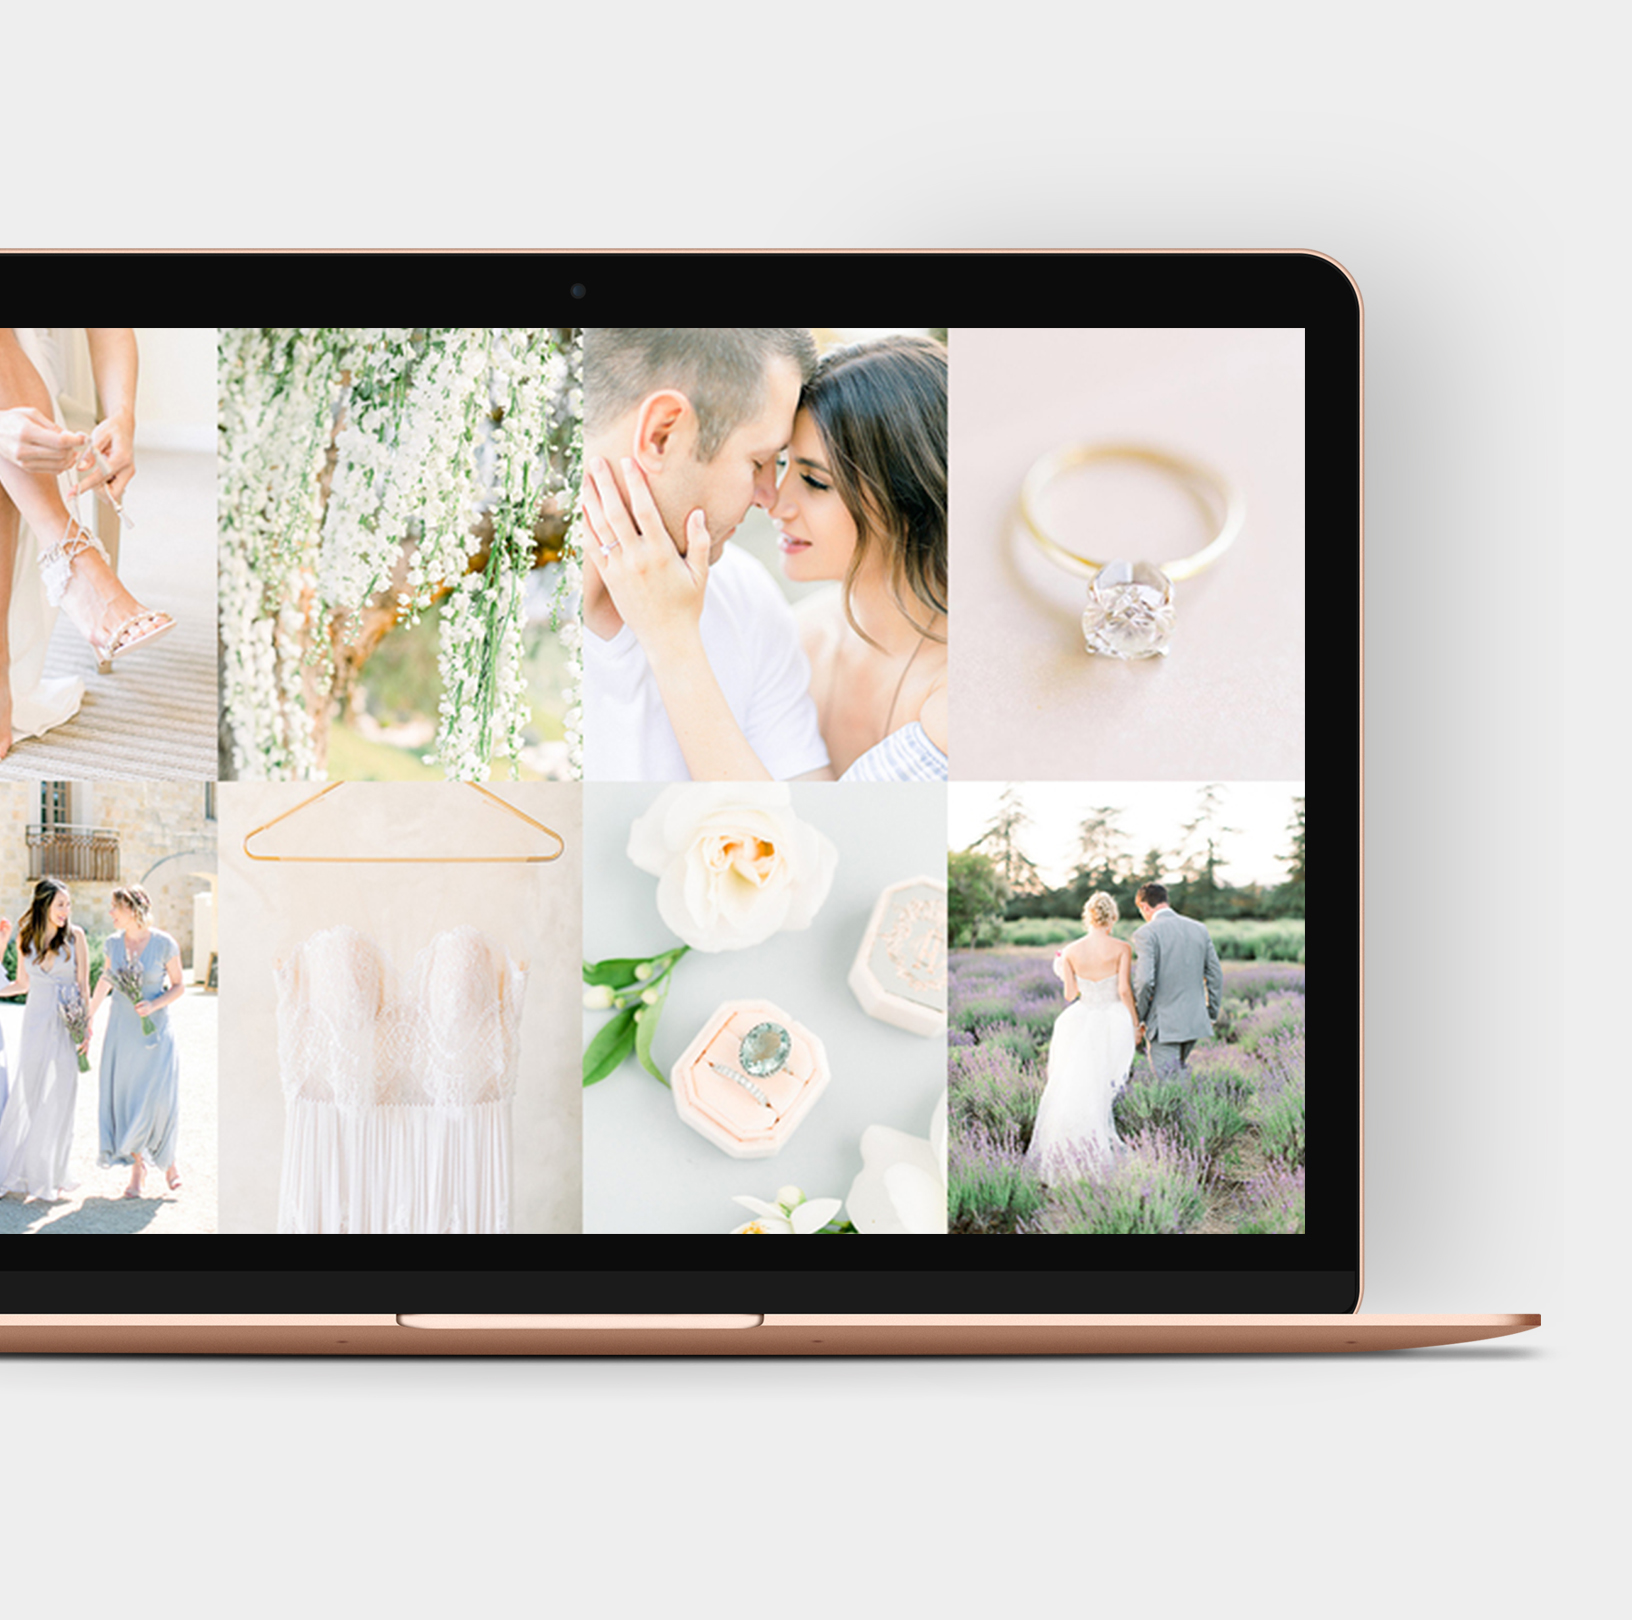 Desktop— - Presets For Professional Photographers